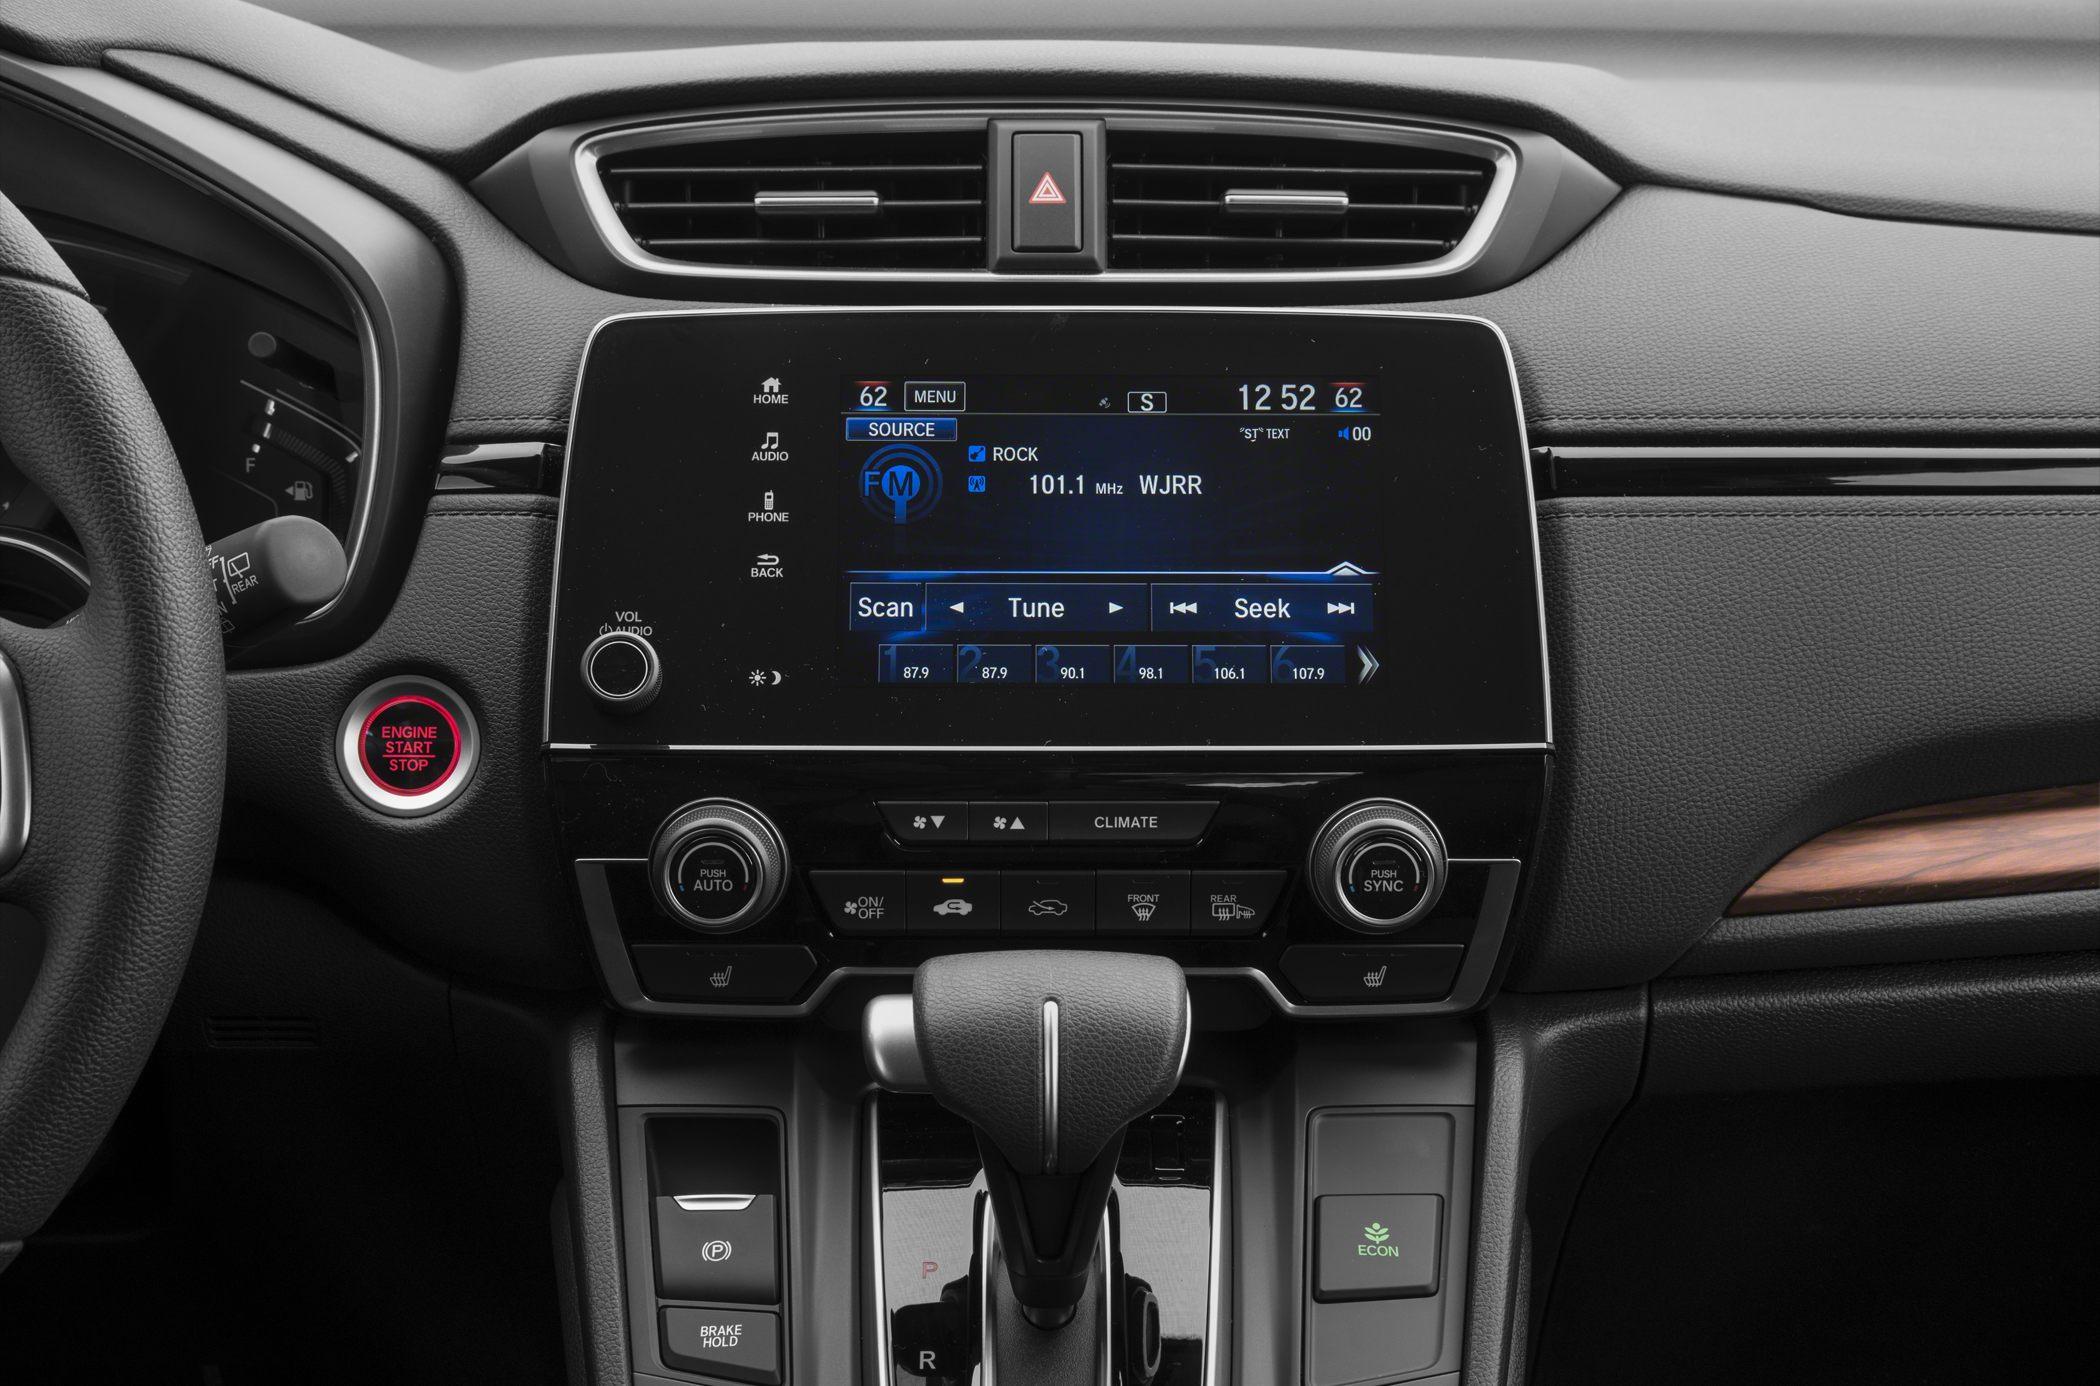 Used 2017 Honda CR V EX   Inventory Vehicle Details At Bruce Titus Port  Orchard Ford   Your Port Orchard, Washington Ford Dealer